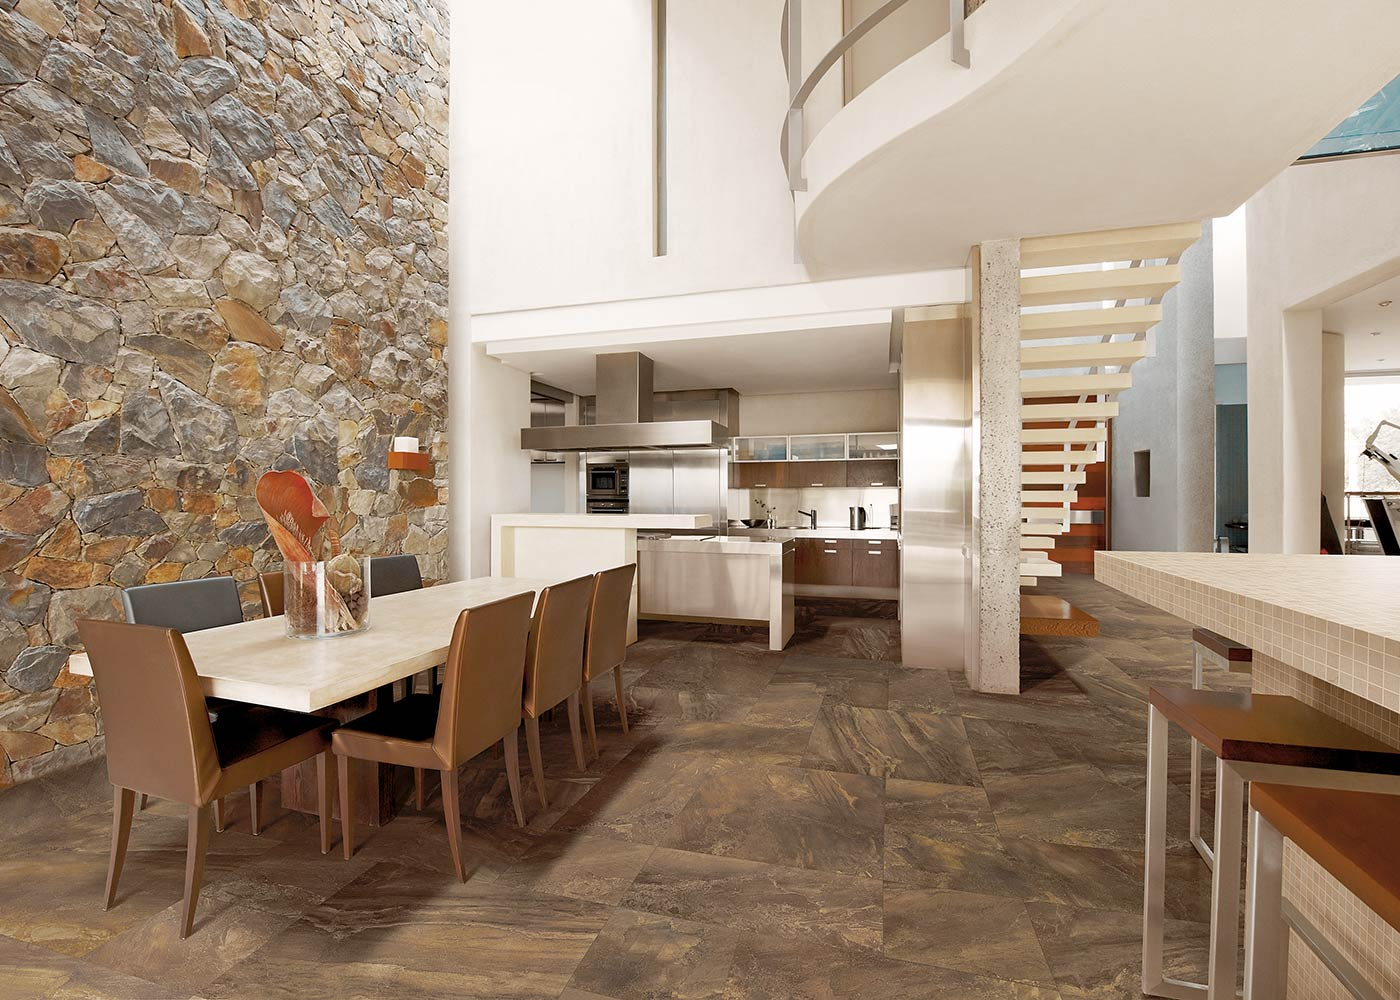 k che inspiration fliesen schacher n rnberg. Black Bedroom Furniture Sets. Home Design Ideas